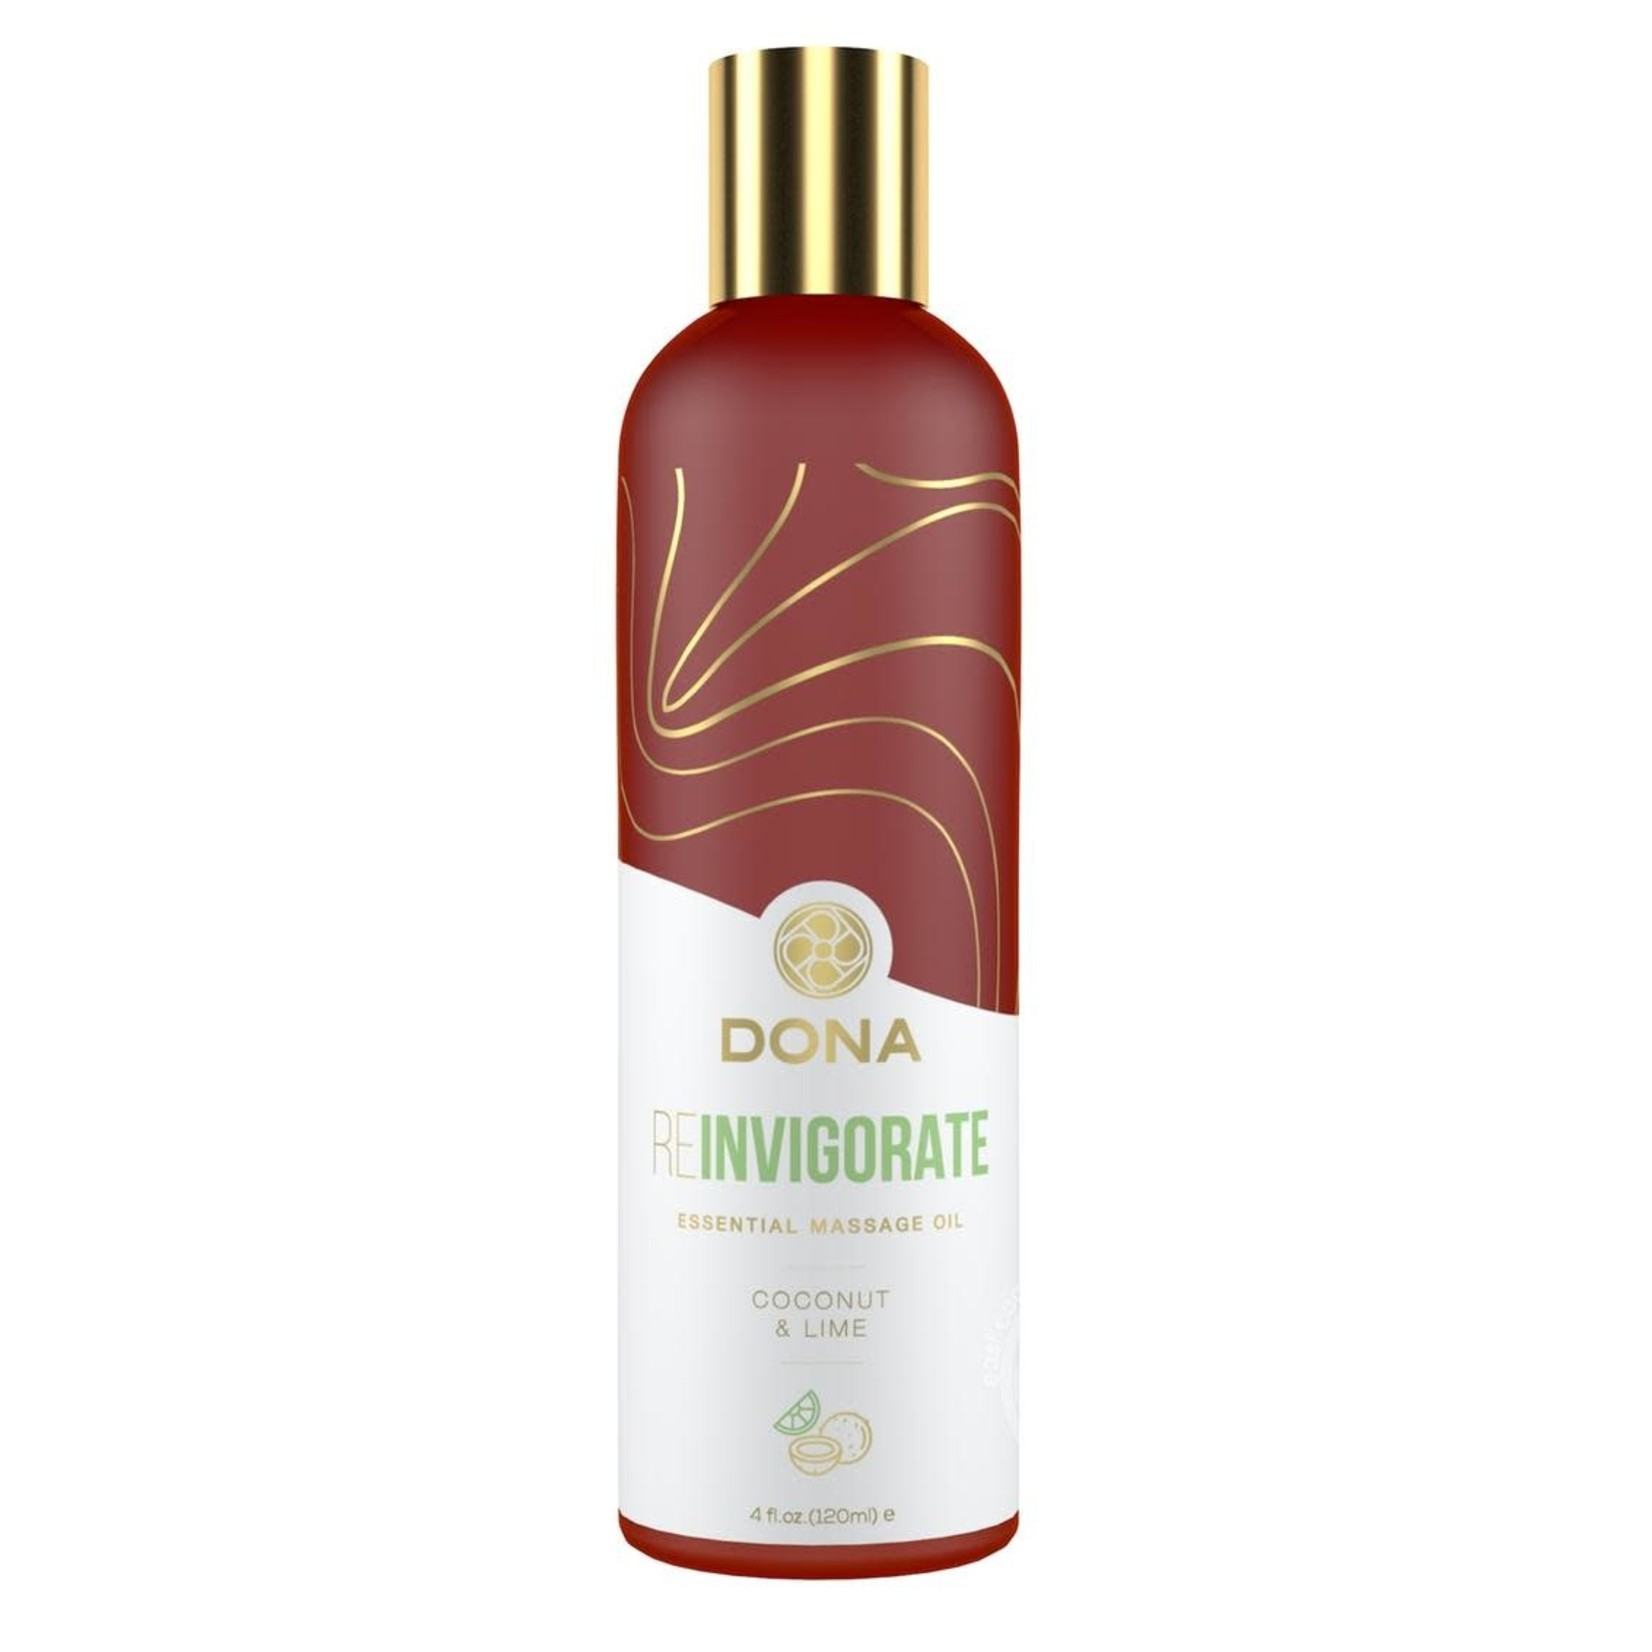 Dona Reinvigorate Vegan Massage Oil Coconut & Lime 4oz